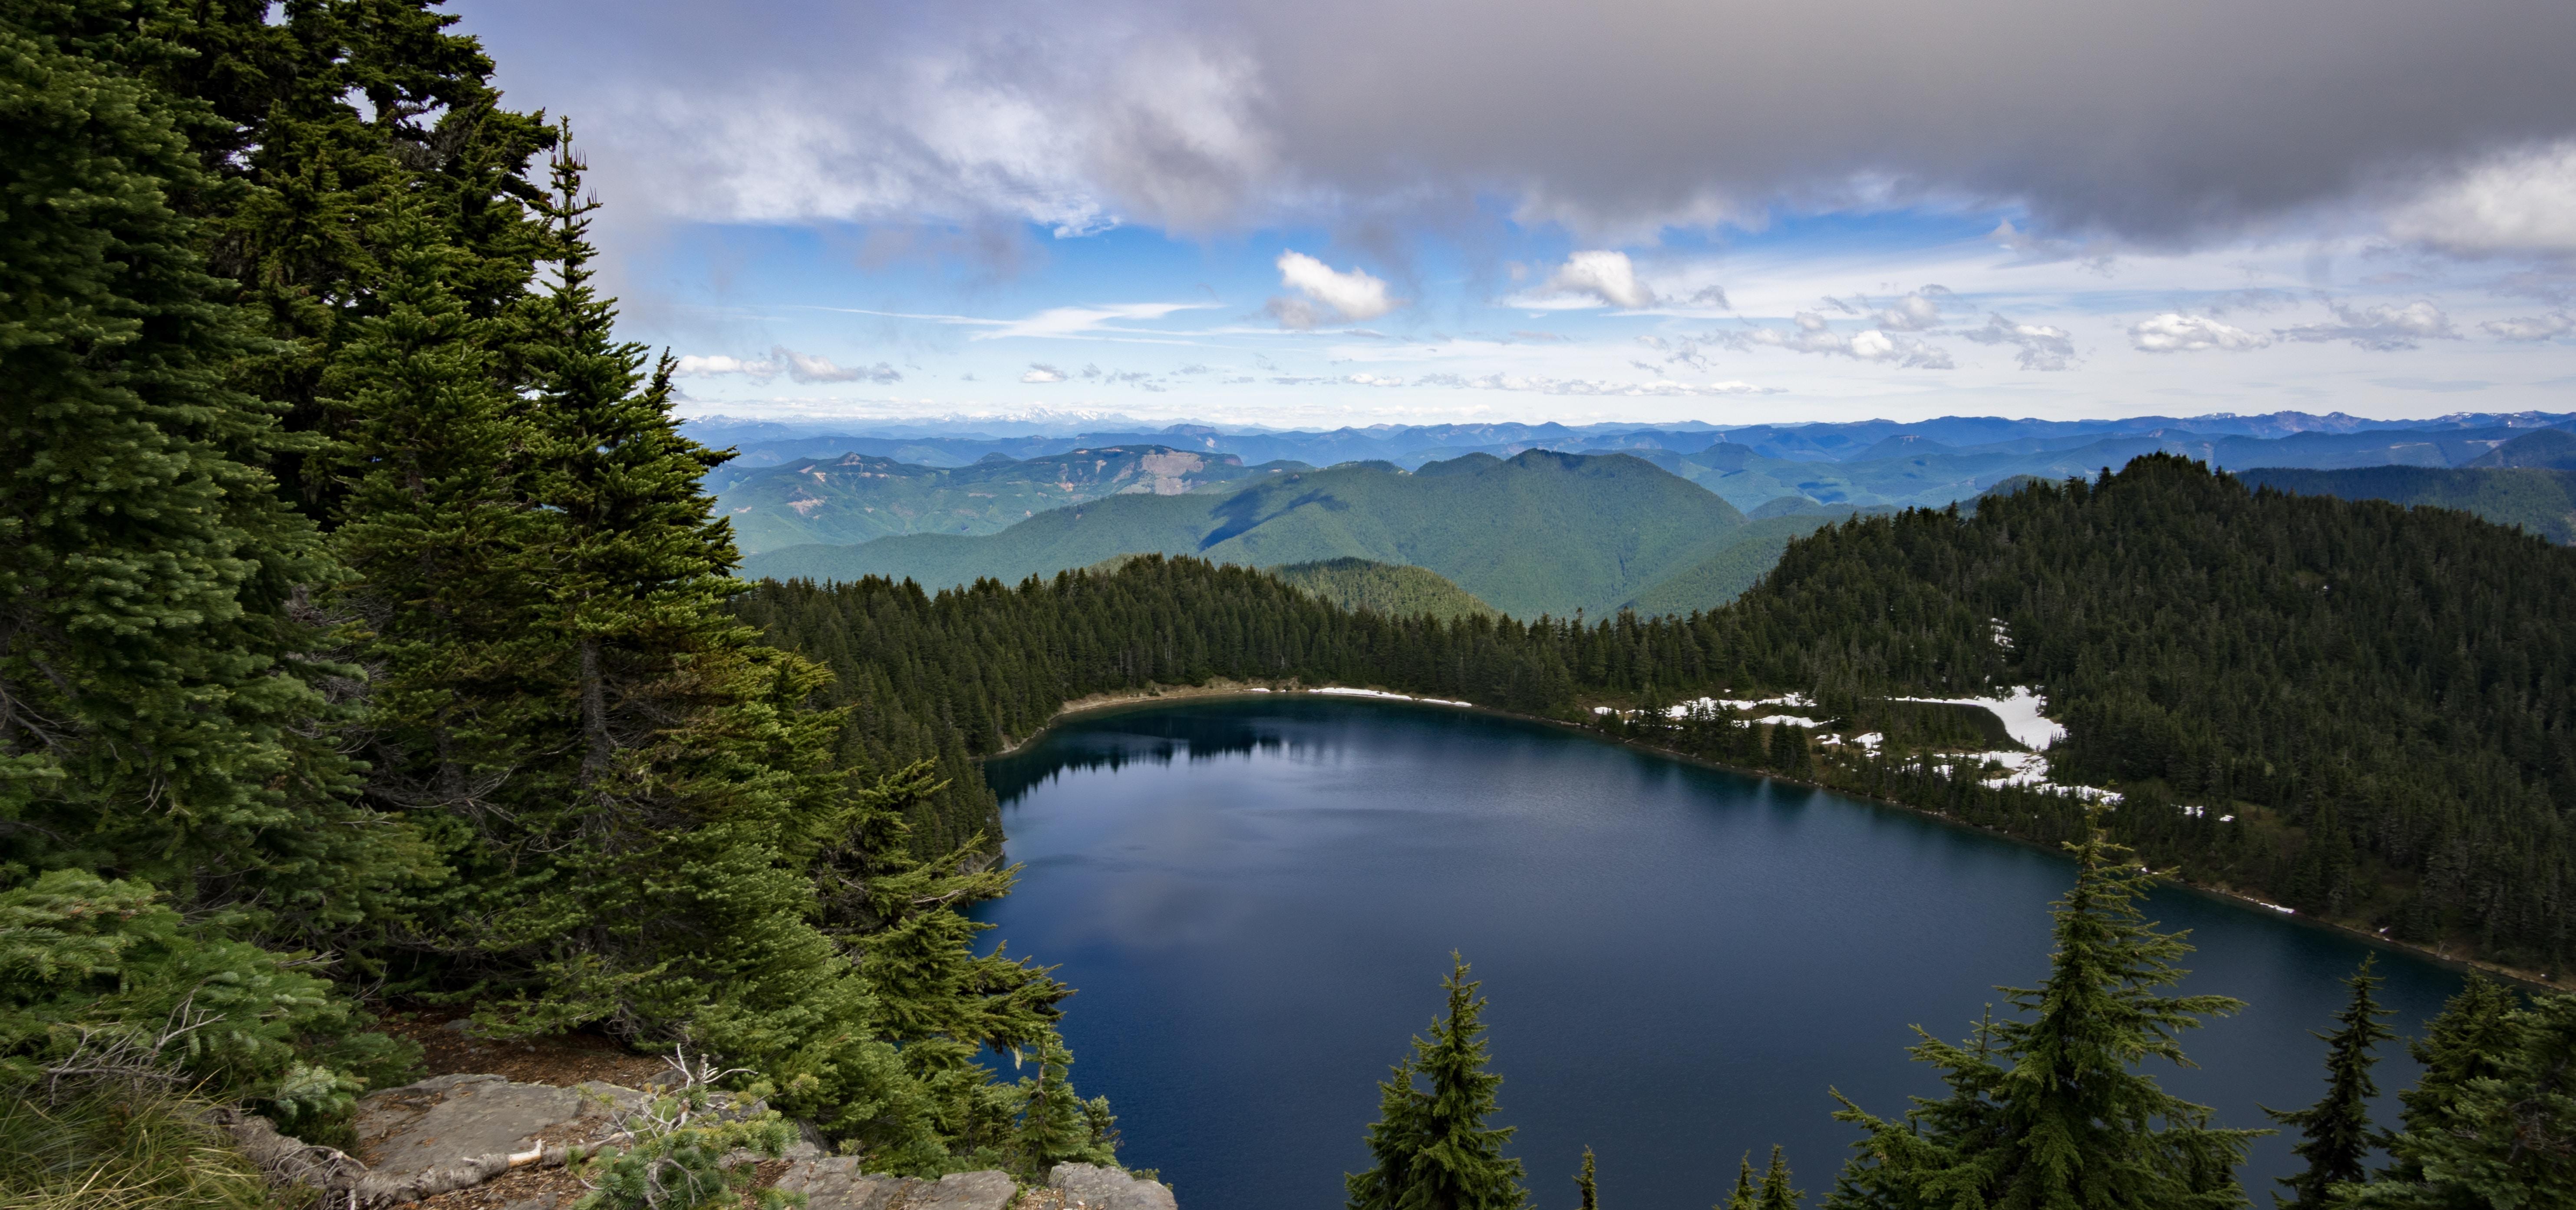 A smooth dark lake among green hills